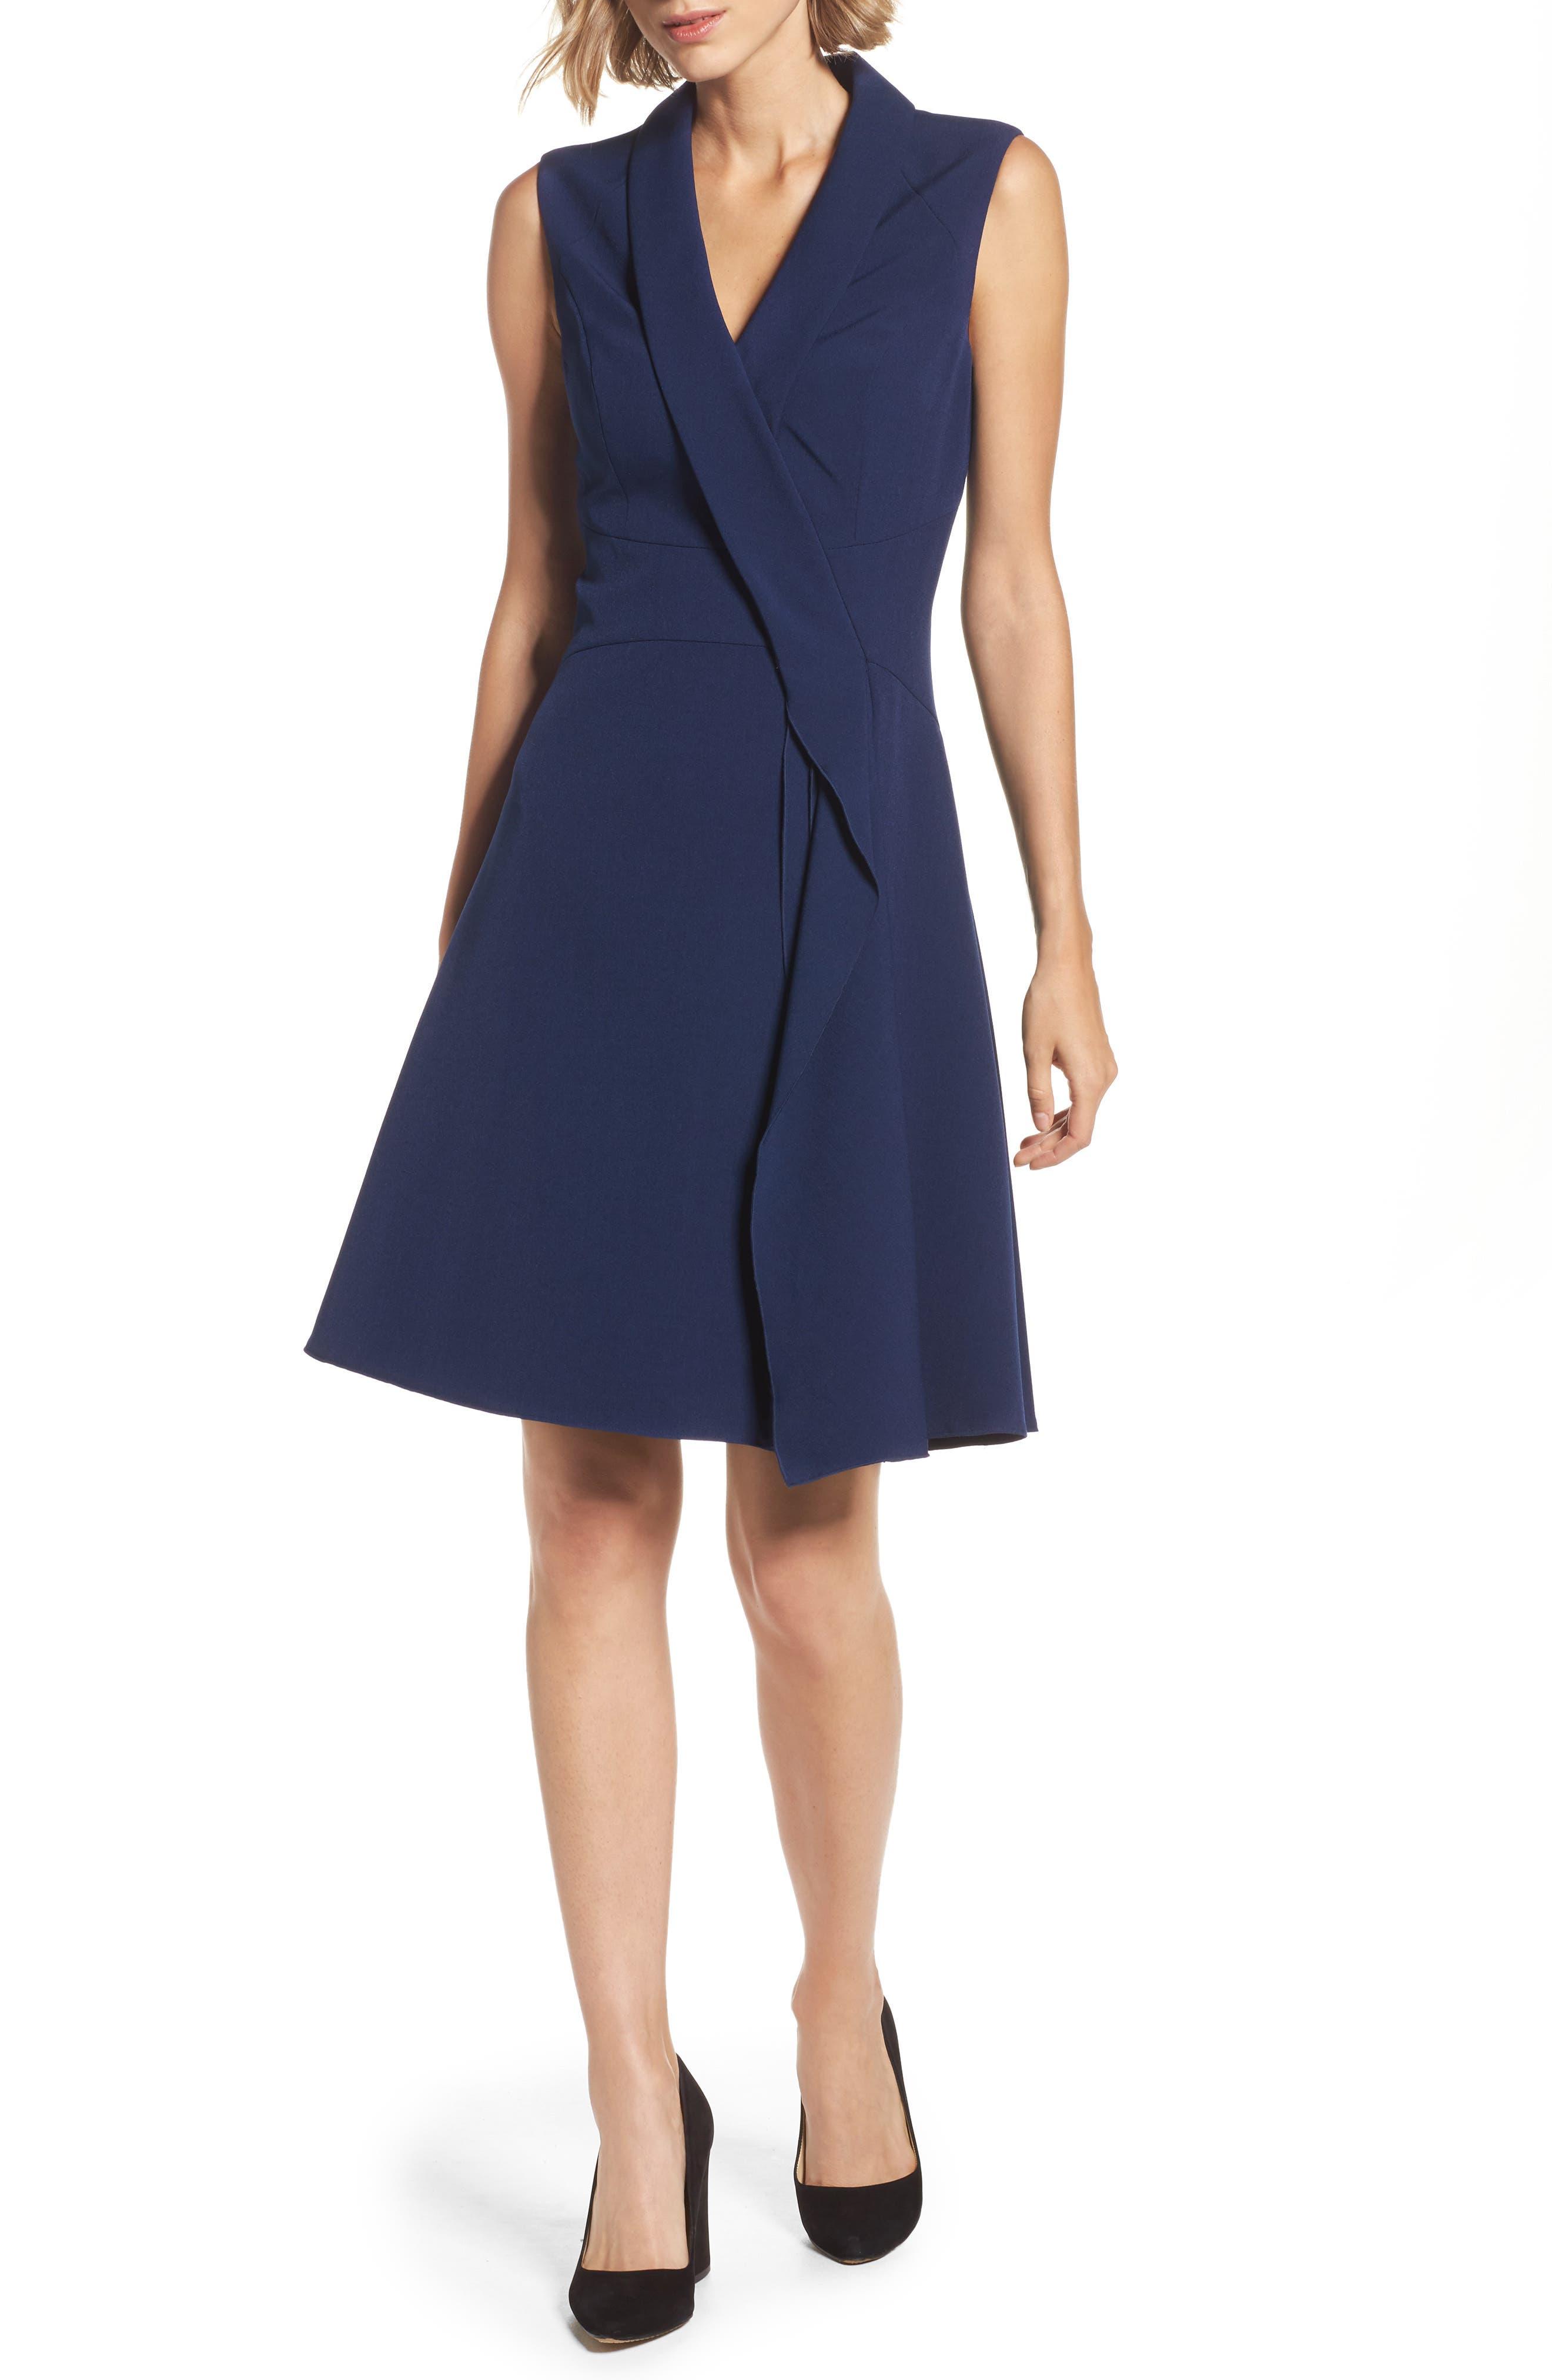 Main Image - Adrianna Papell Stretch Crepe A-Line Dress